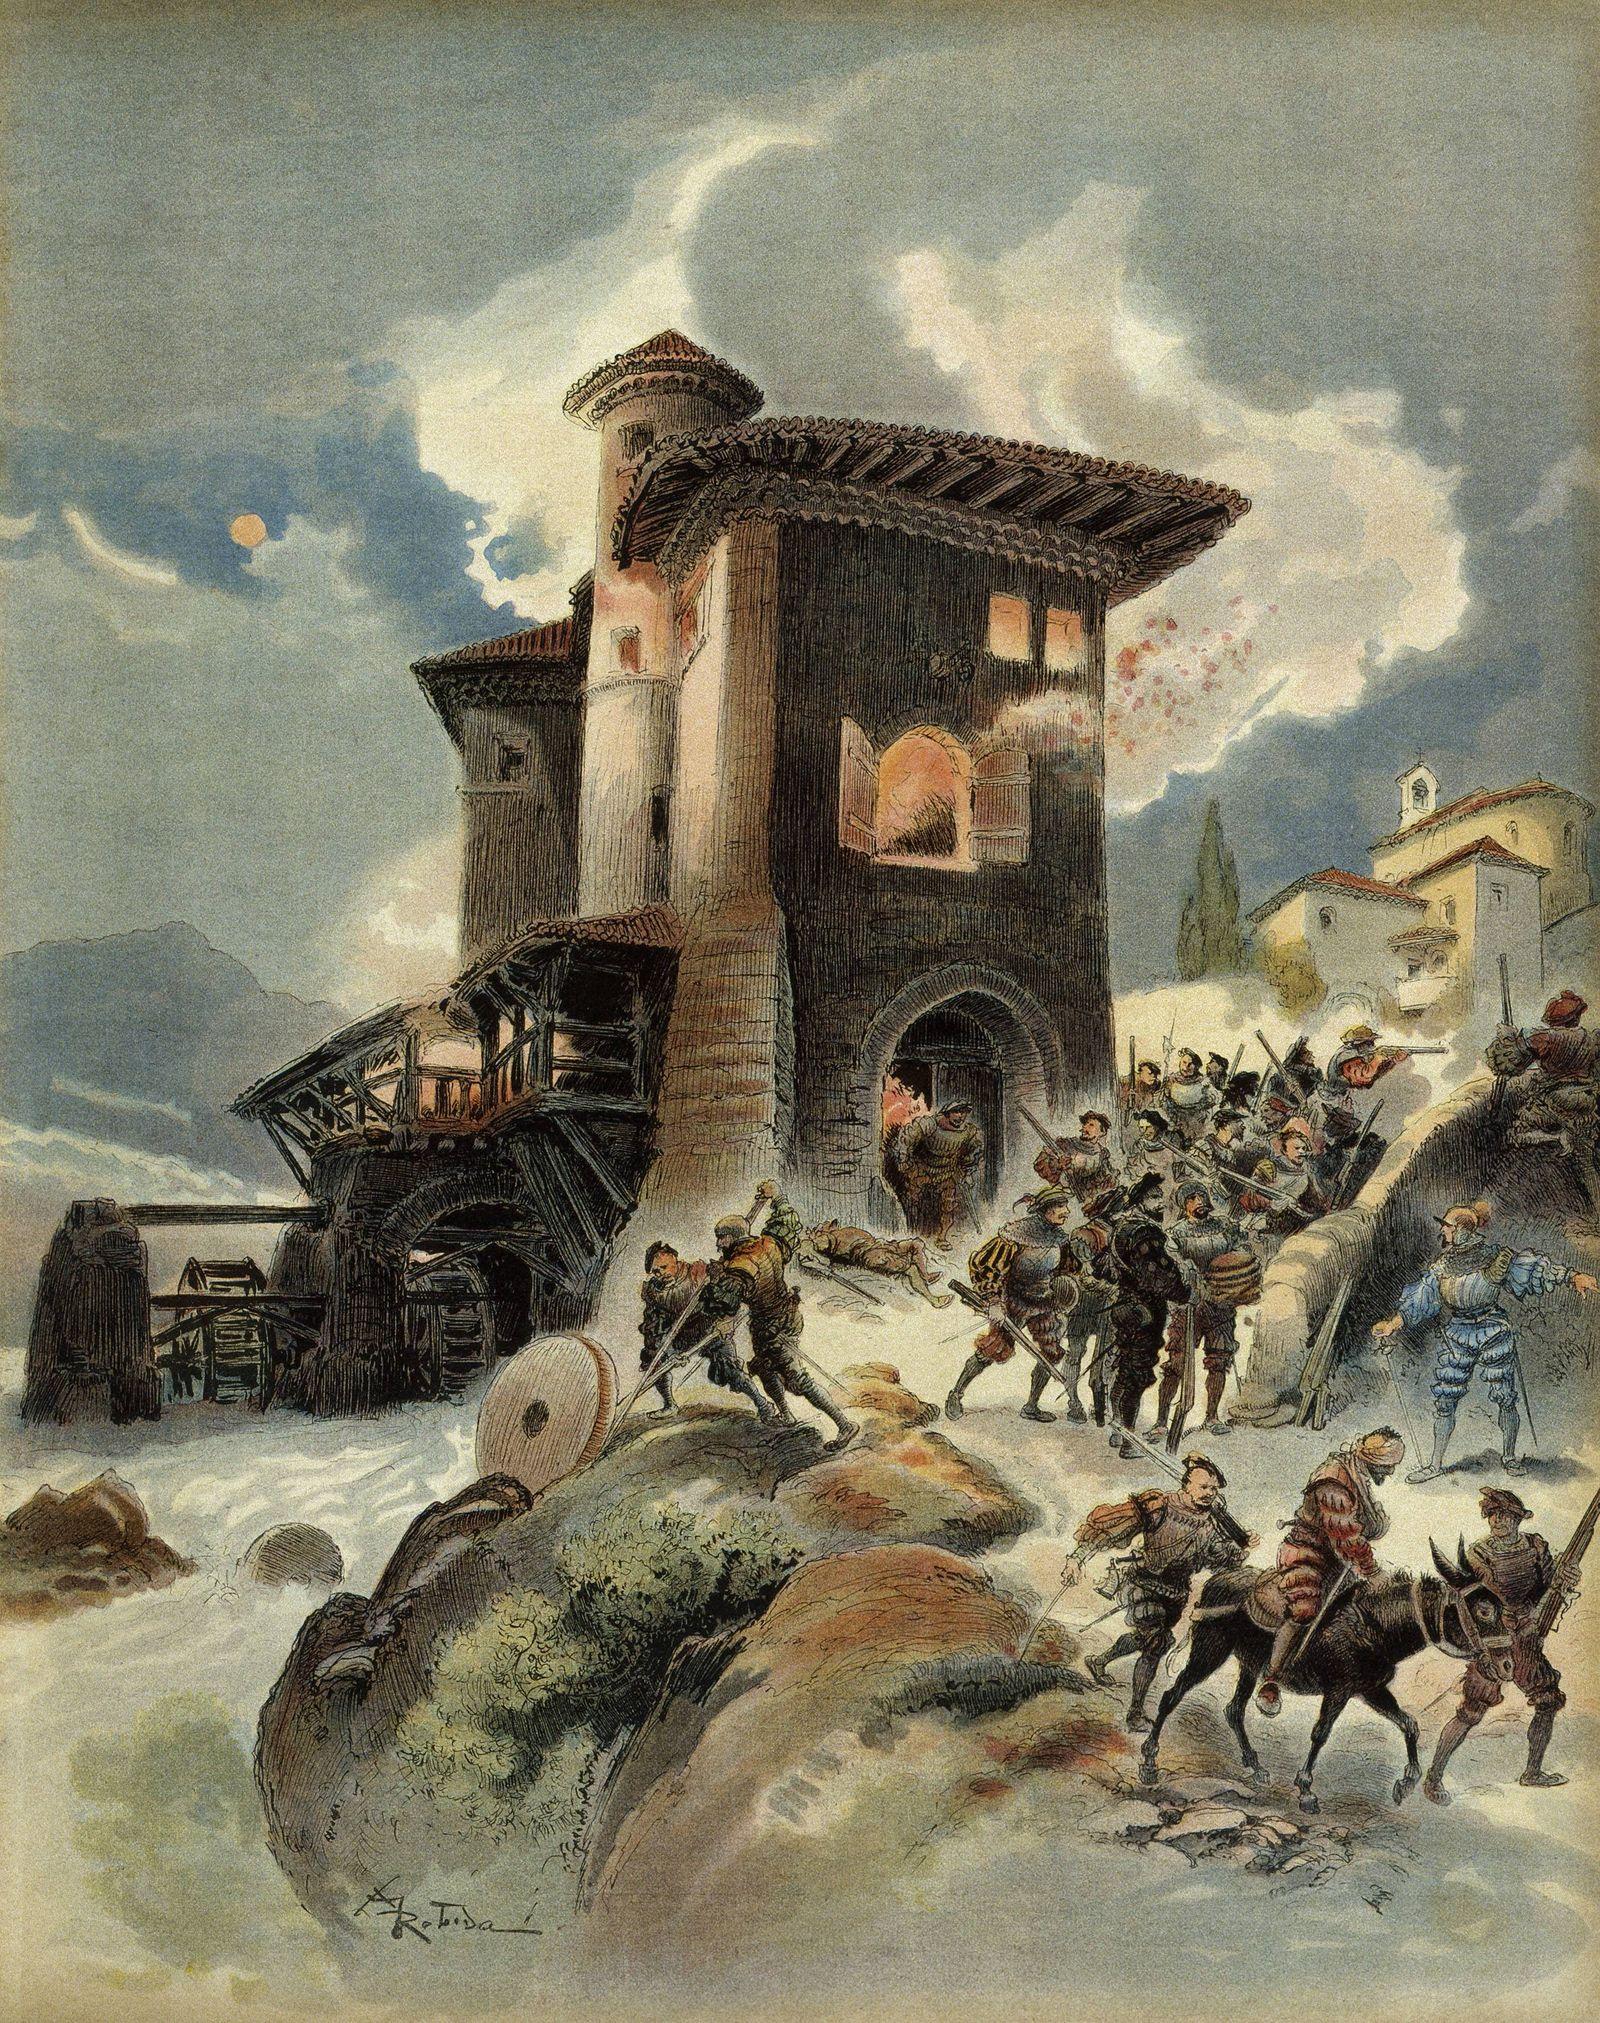 C17415 Albert Robida 1848 1926 Blaise de Montluc seizes the mills of Auriol and kills the imper